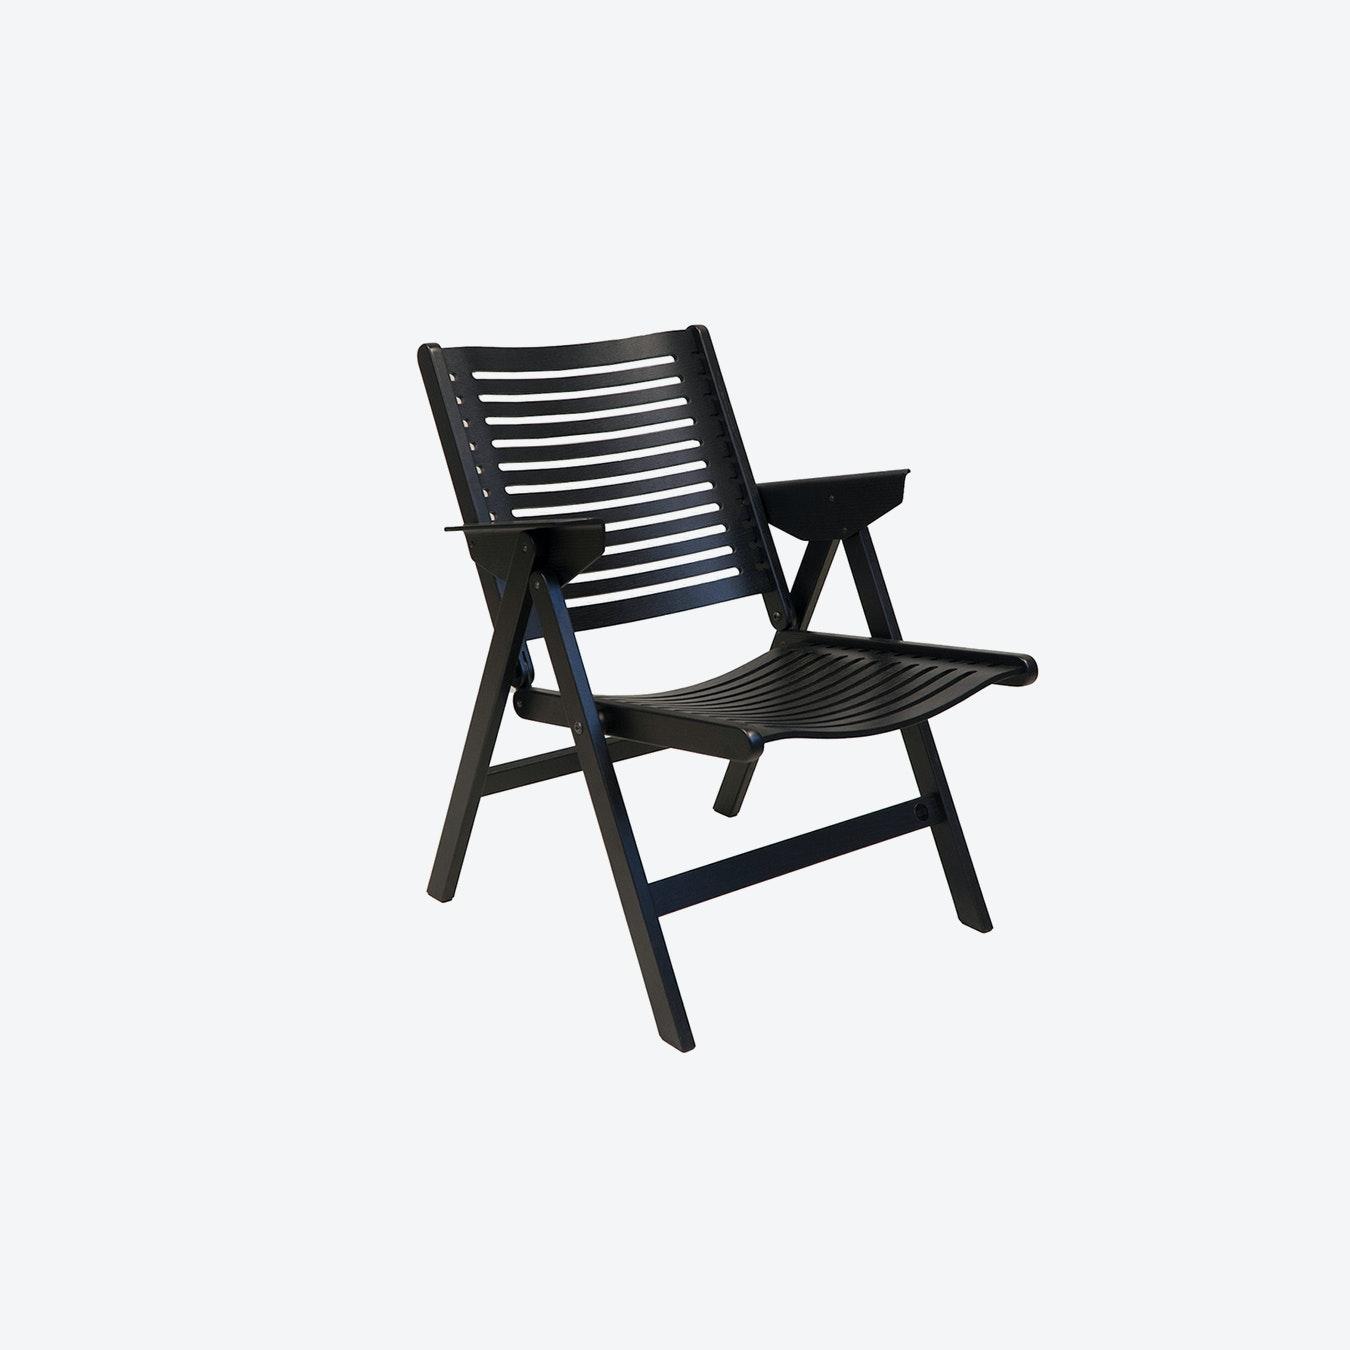 Swell Rex Lounge Chair In Black Ashwood Theyellowbook Wood Chair Design Ideas Theyellowbookinfo